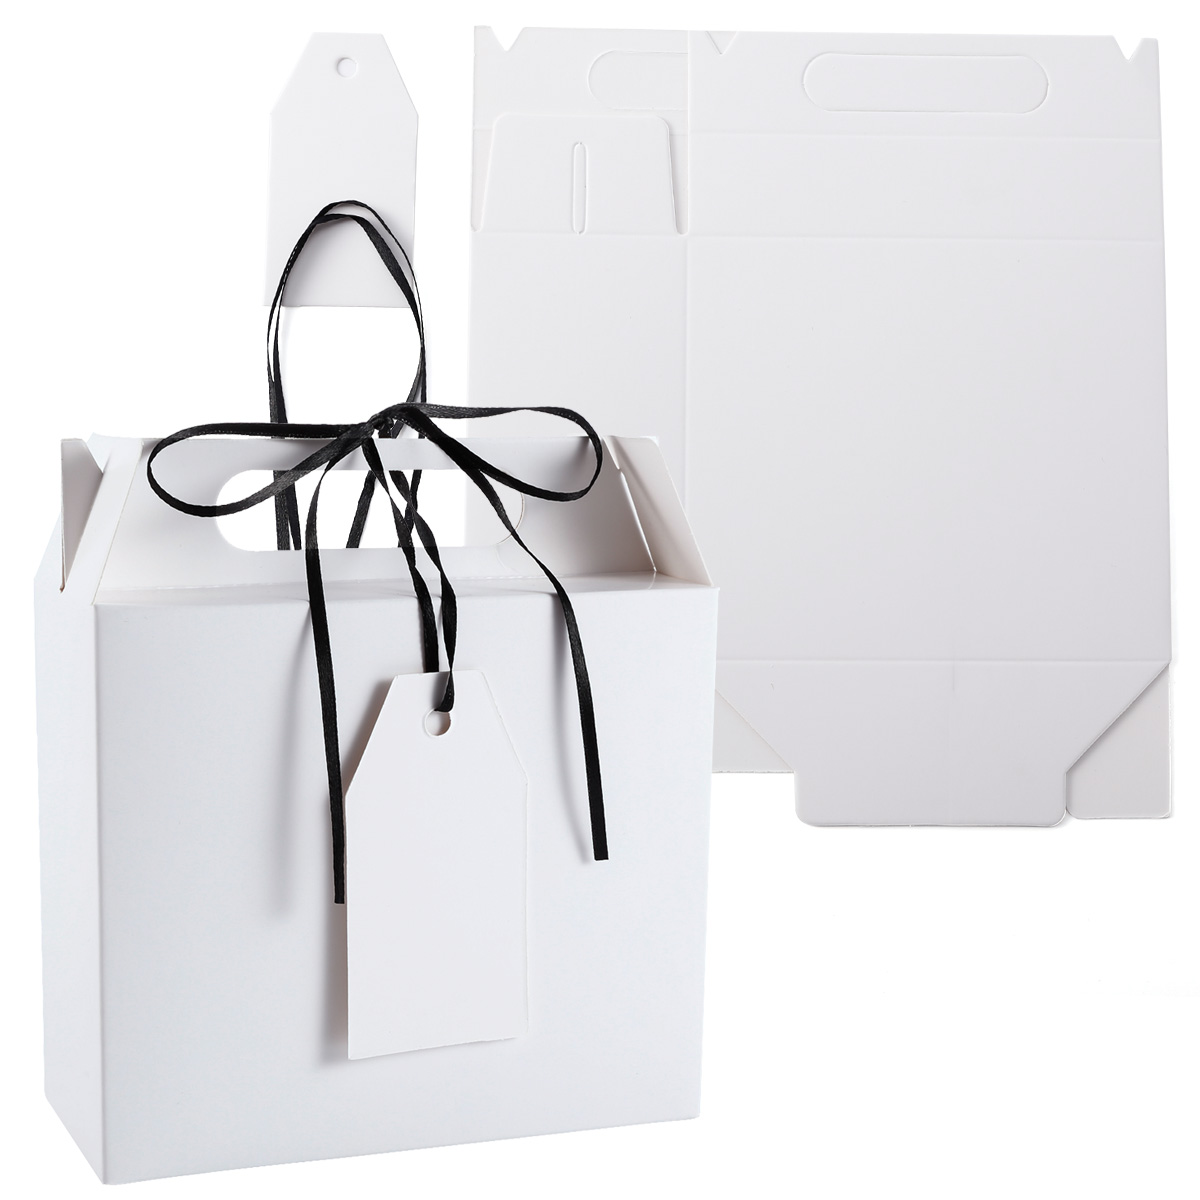 25pcs bo te cadeau blanche av poign e ruban noir tiquette inscriptible ebay. Black Bedroom Furniture Sets. Home Design Ideas